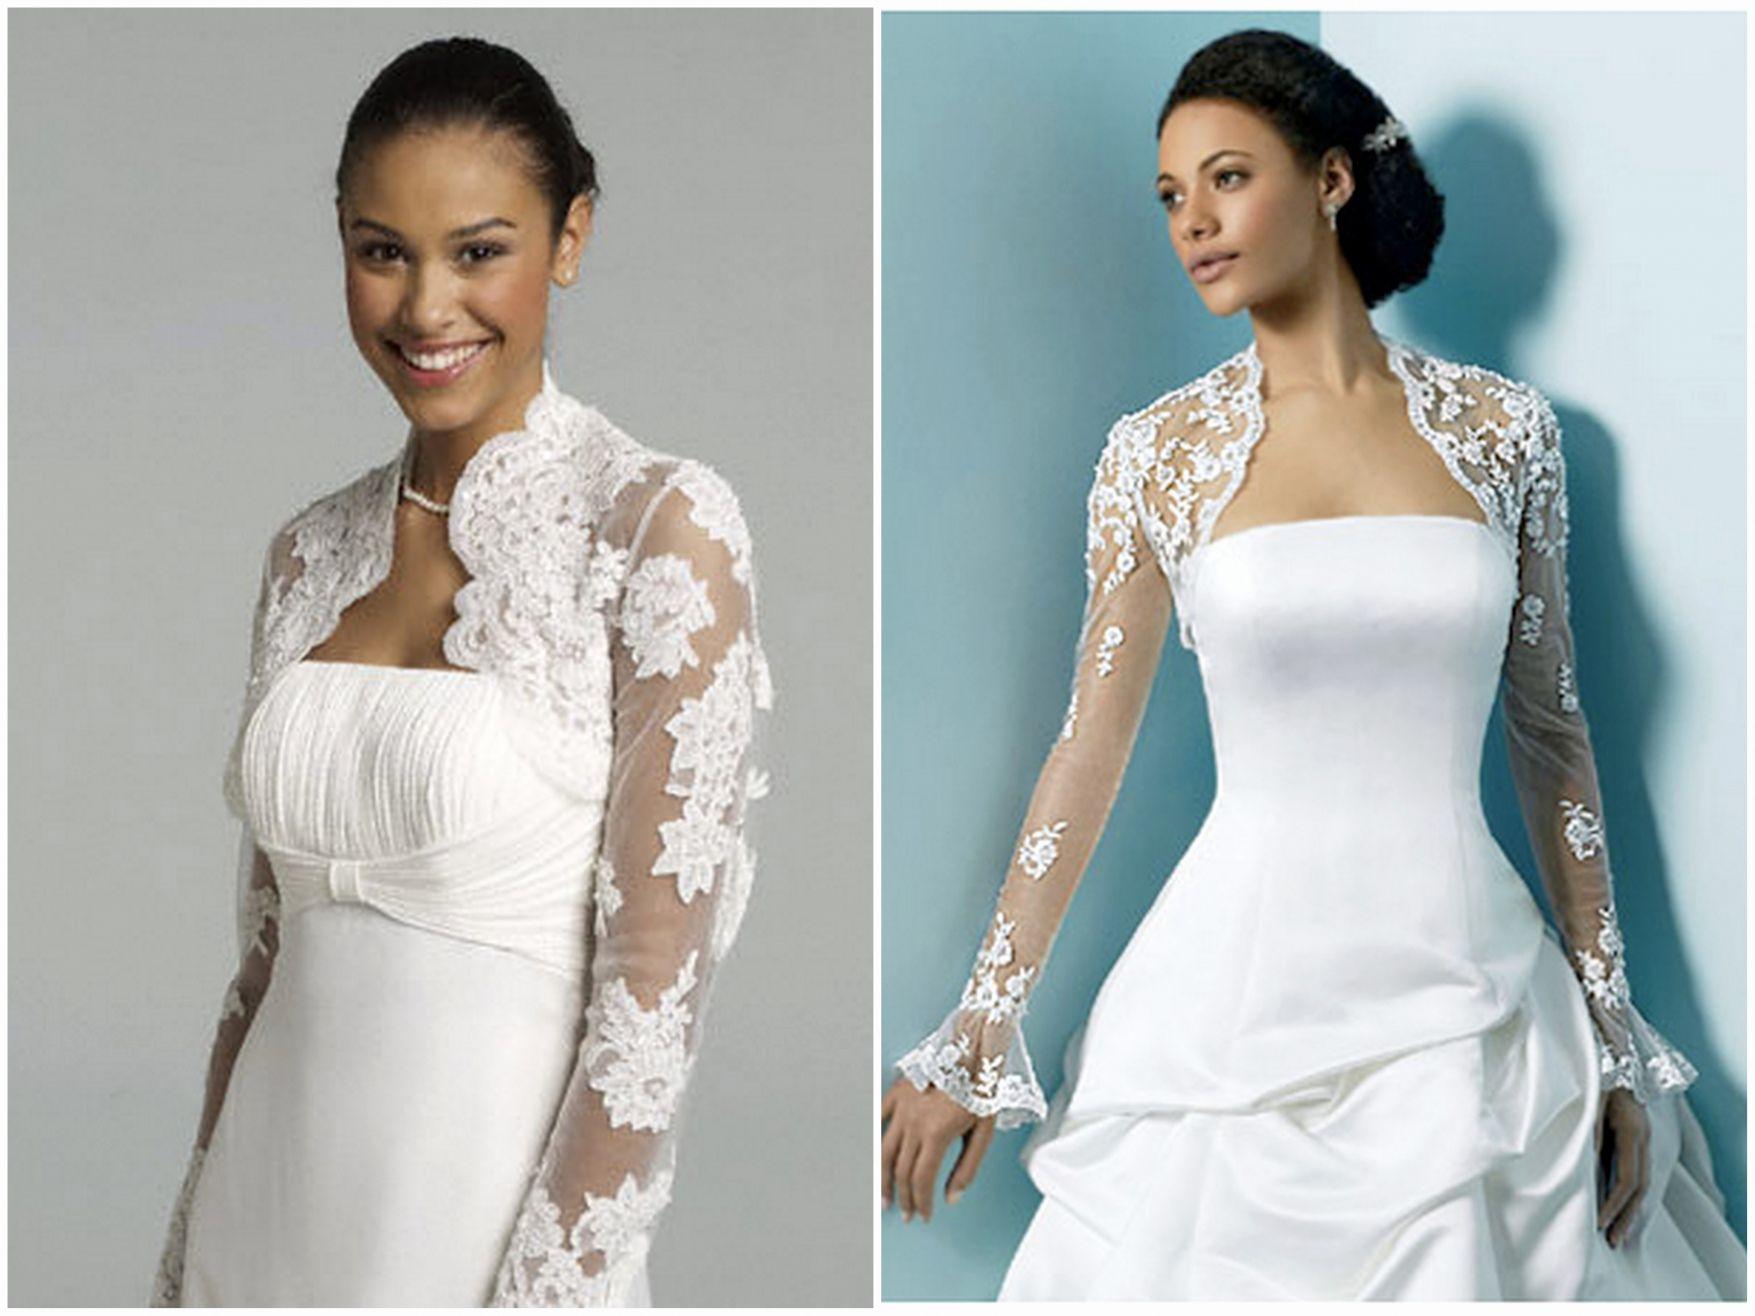 77+ Wedding Dresses Houston Tx - Wedding Dresses for the Mature ...